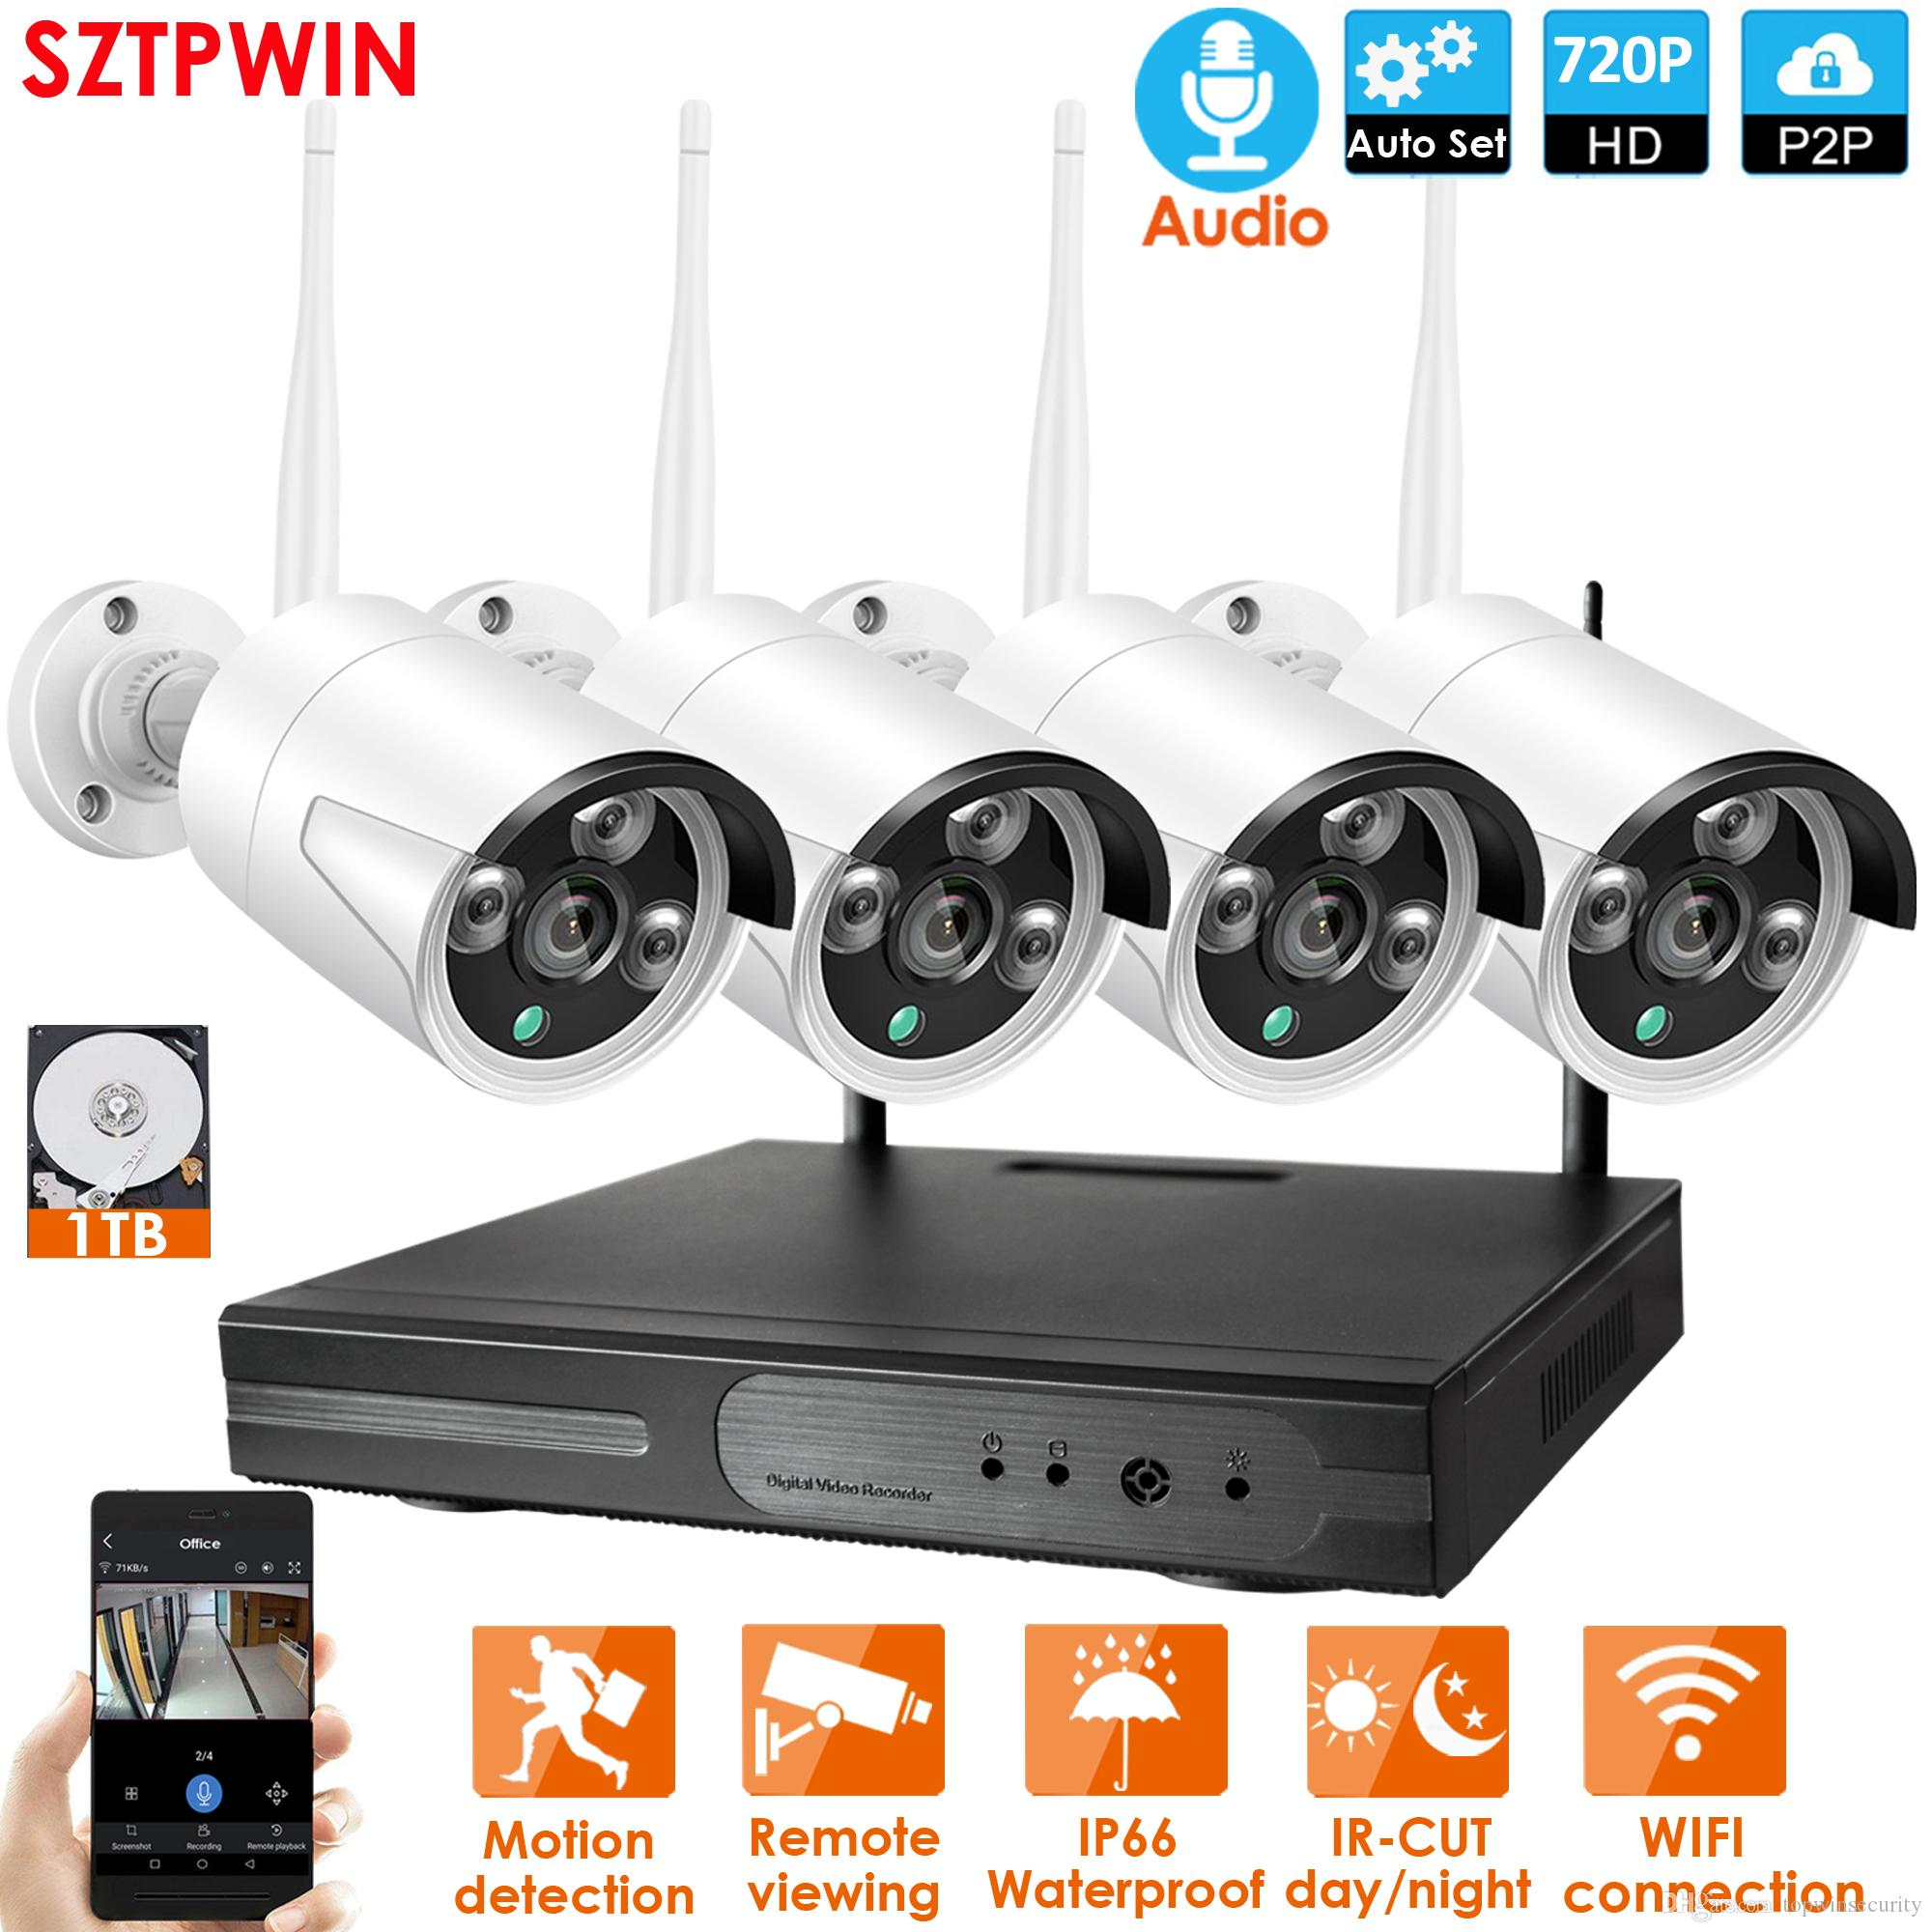 4CH الصوت نظام الدوائر التلفزيونية المغلقة 720P اللاسلكية NVR 4PCS 1.0MP IR في الهواء الطلق P2P واي فاي IP CCTV نظام الأمن كاميرا مراقبة كيت المضمن 1TB HDD